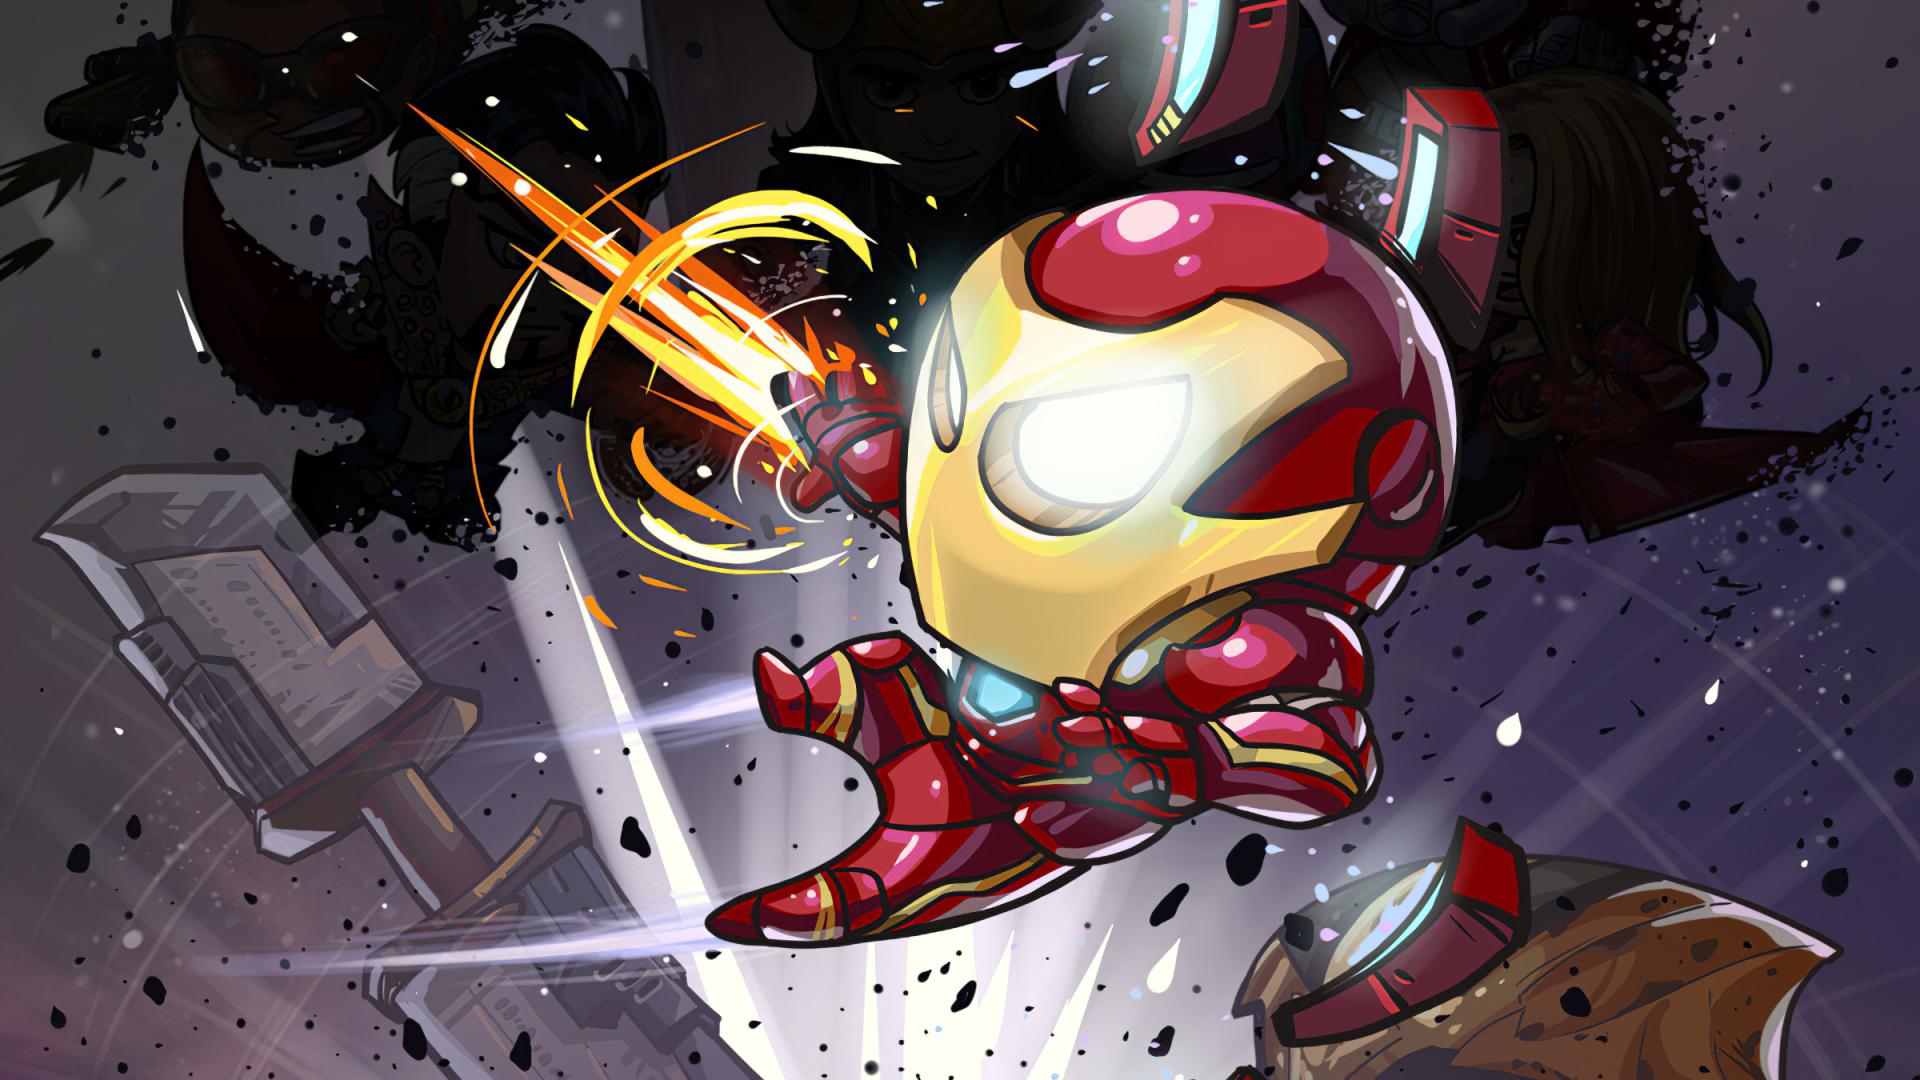 1920x1080 Iron Man Cartoon Marvel Art 1080P Laptop Full HD ...